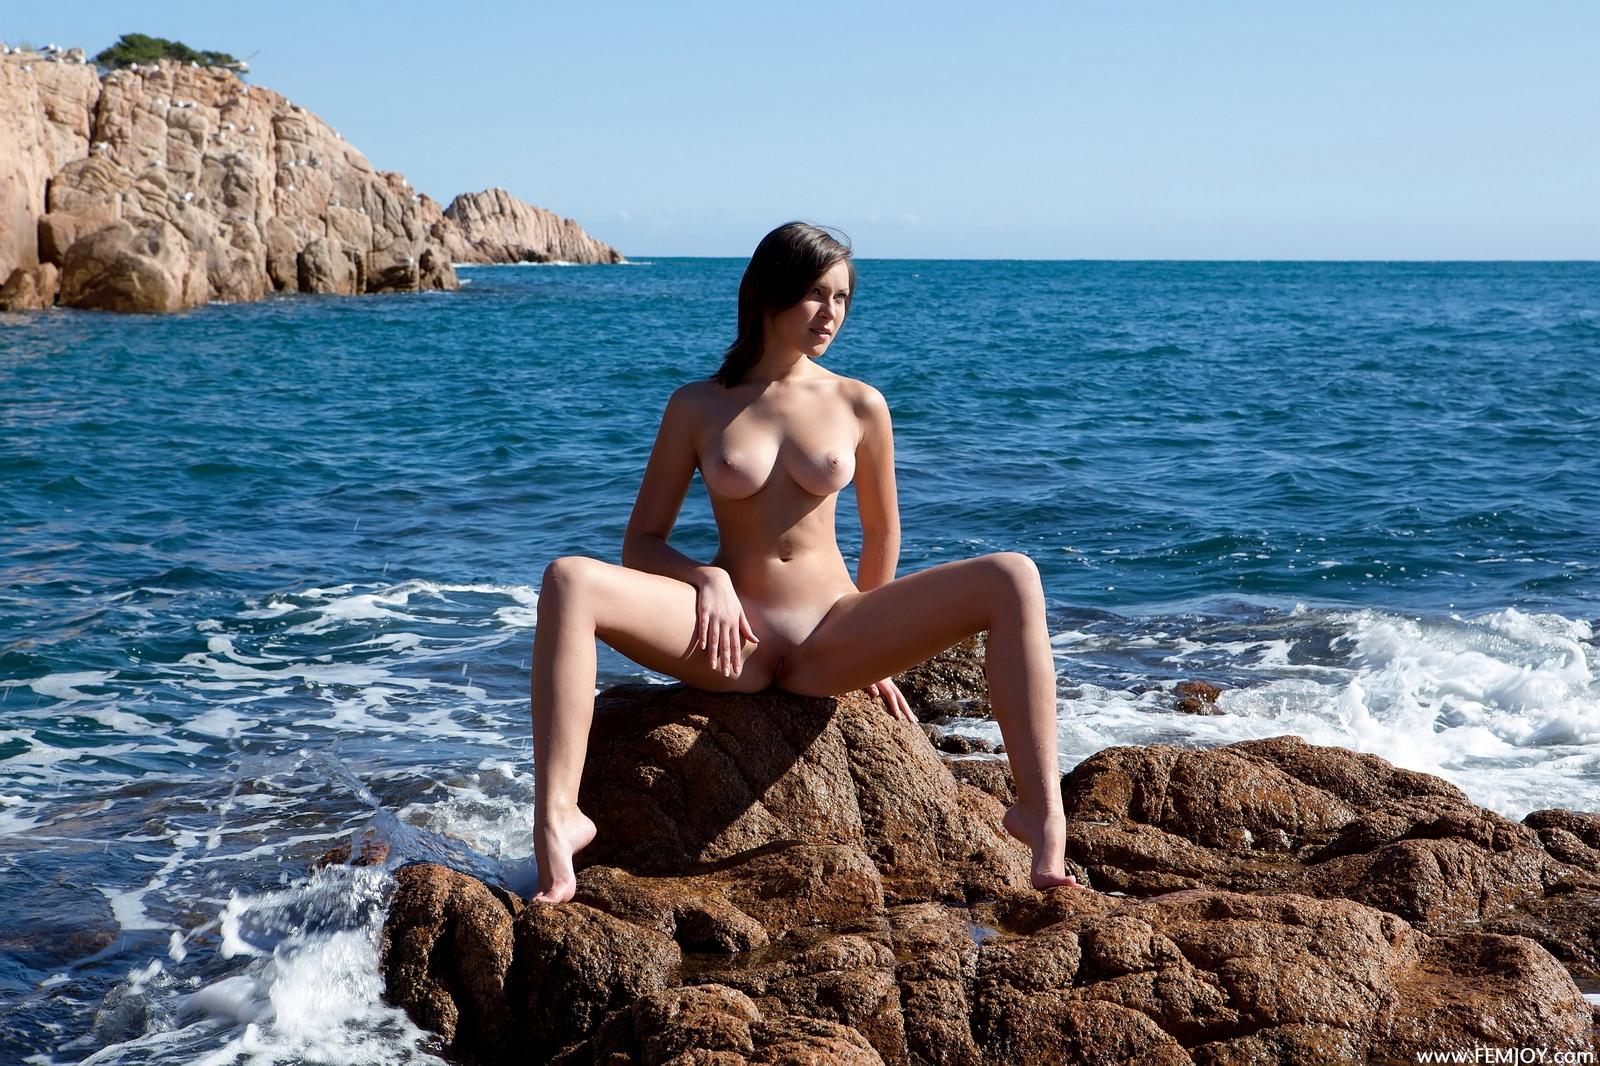 sophia-h-seaside-naked-boobs-rocks-femjoy-10